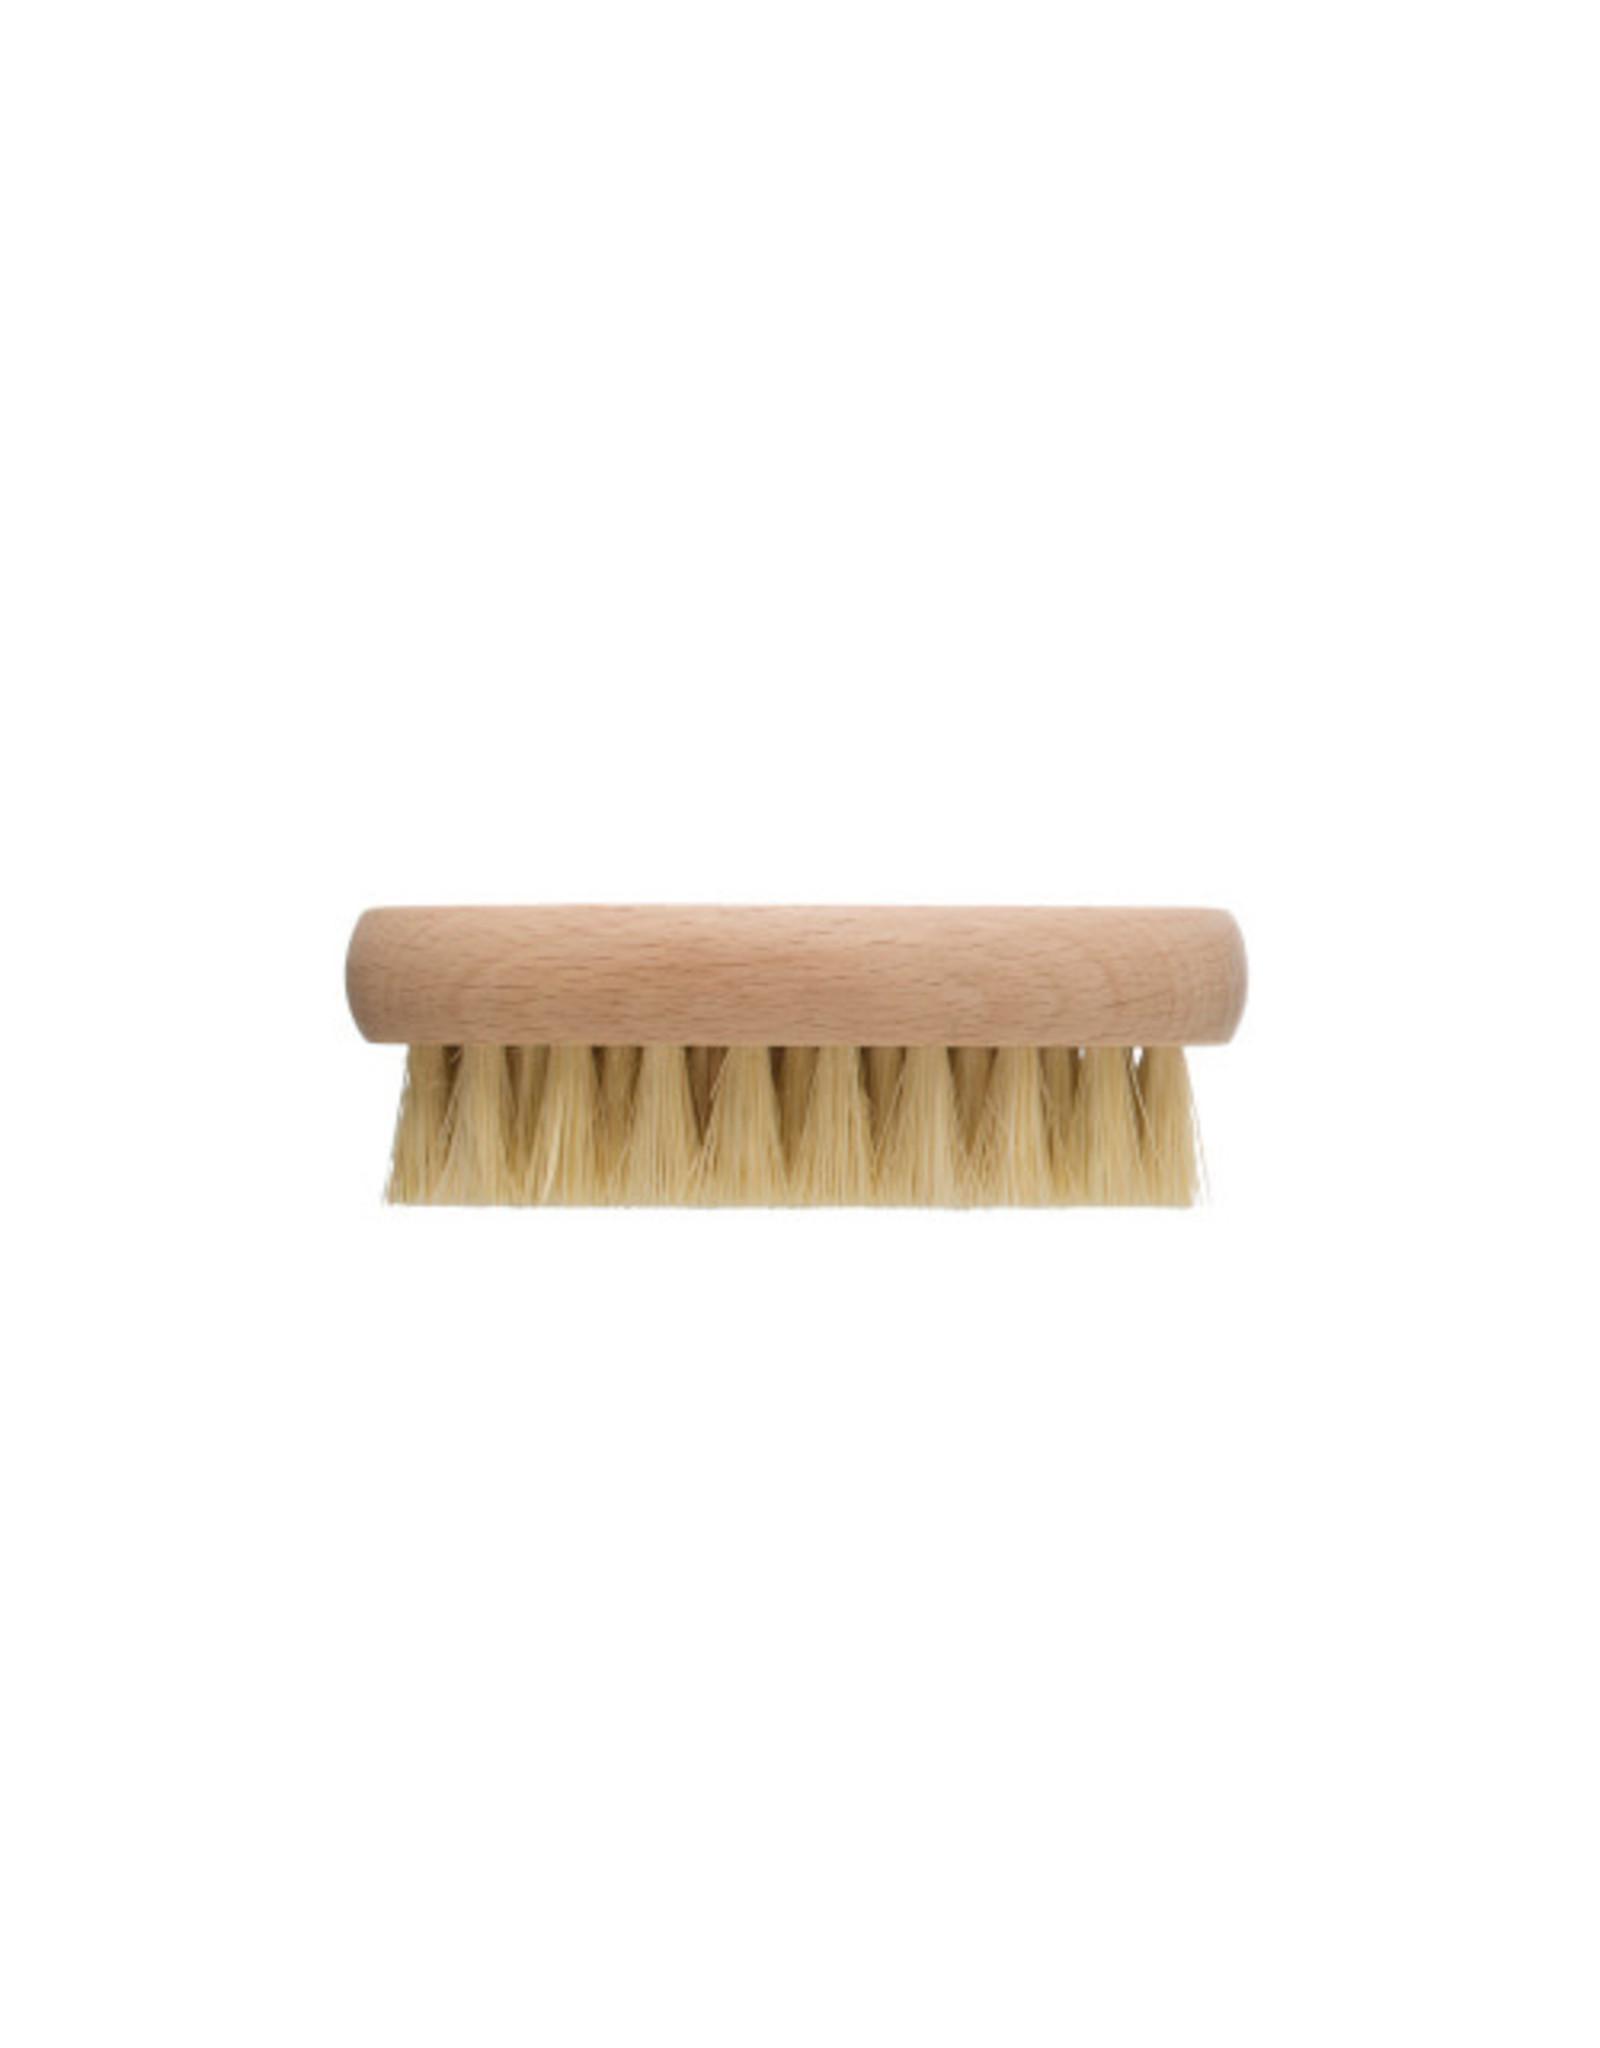 Beech Wood Vegetable Brush